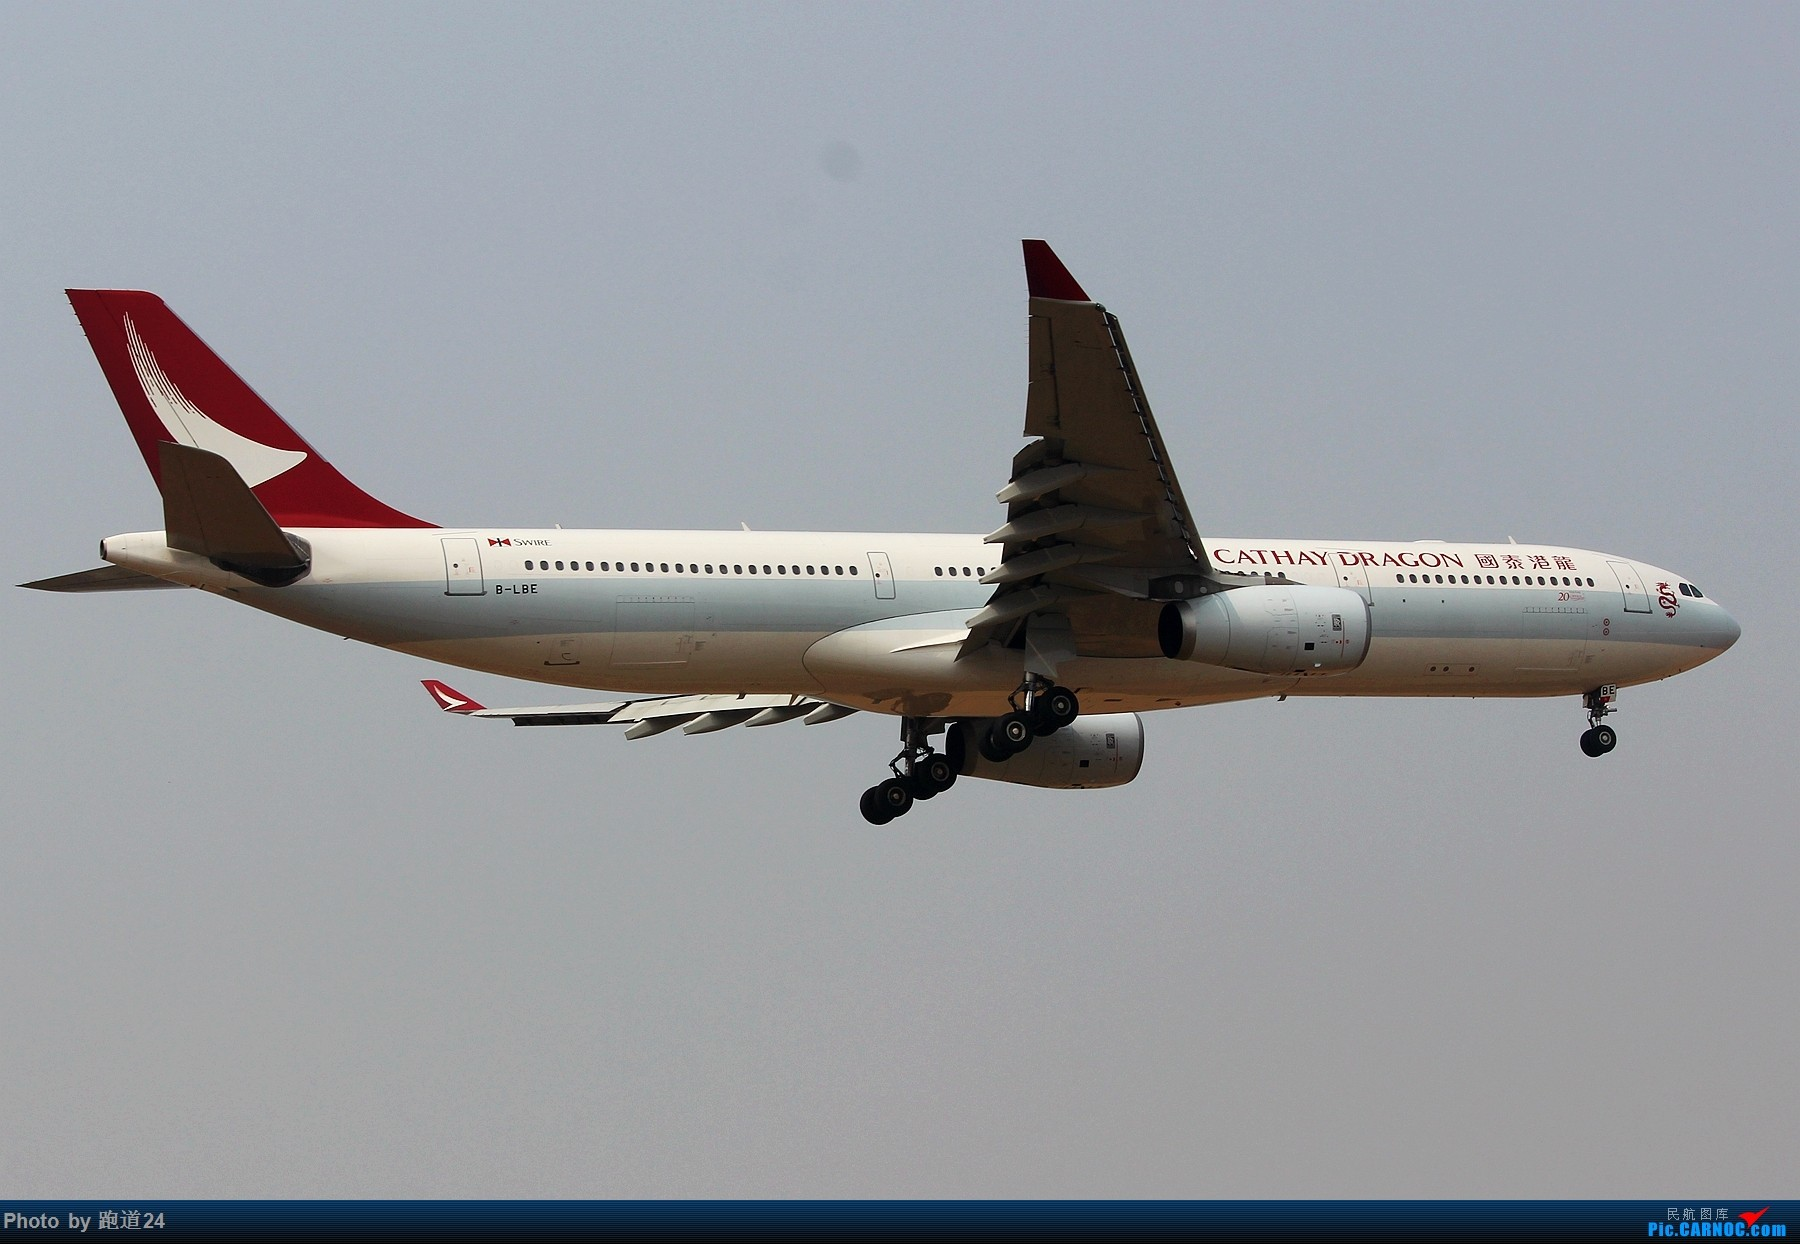 Re:[原创]3月2日CTU拍机[国航748 东方73M 红河水乡等] AIRBUS A330-300 B-LBE 中国成都双流国际机场